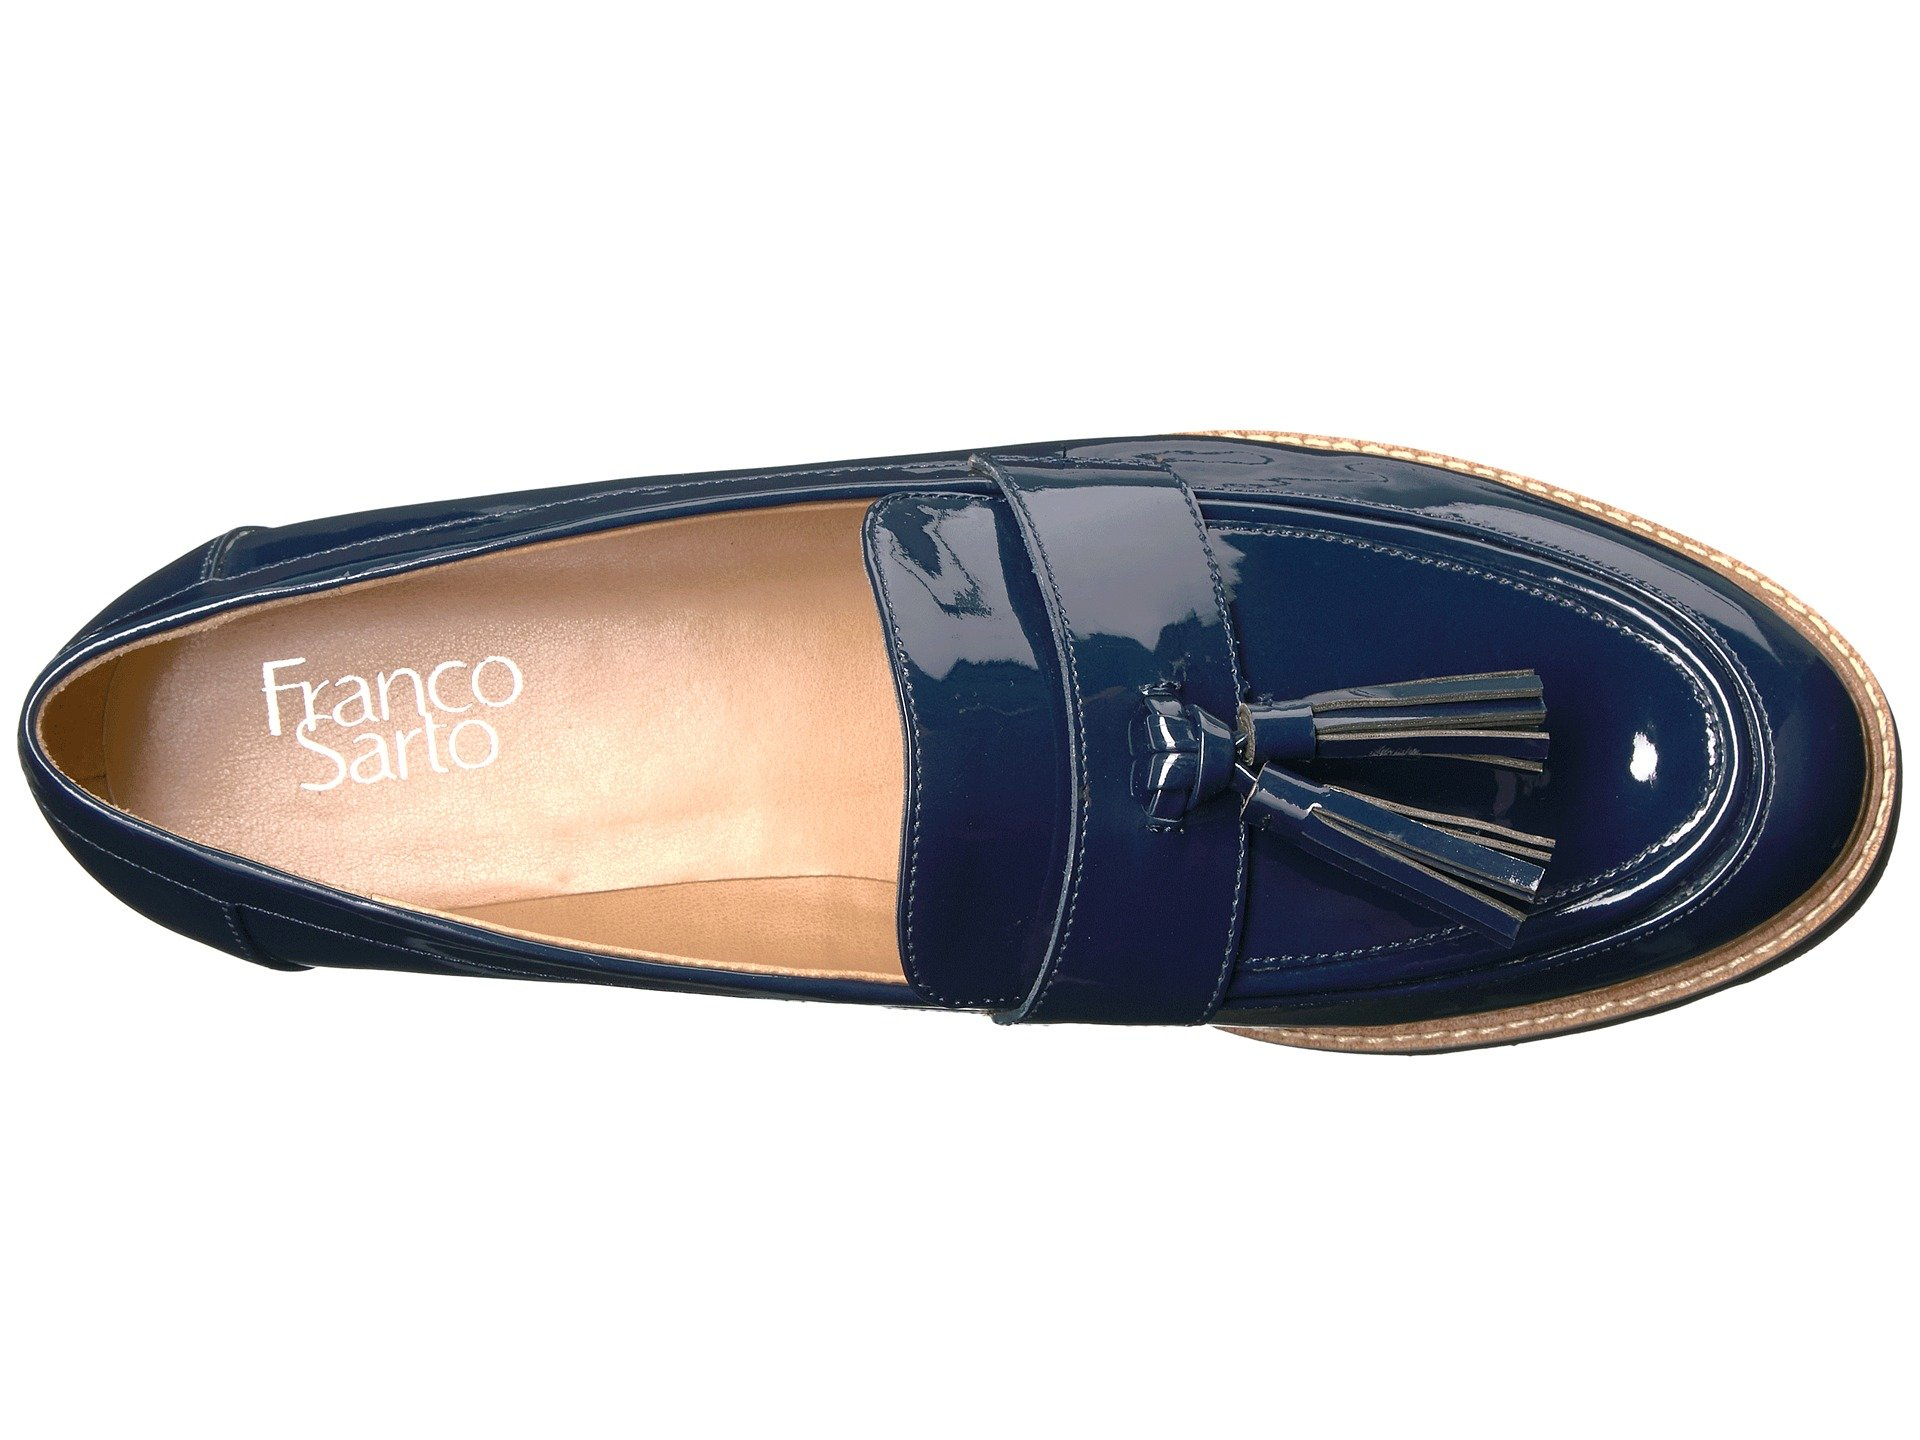 Franco Sarto Navy Carolynn Sarto Inky Franco Carolynn agwqZTx